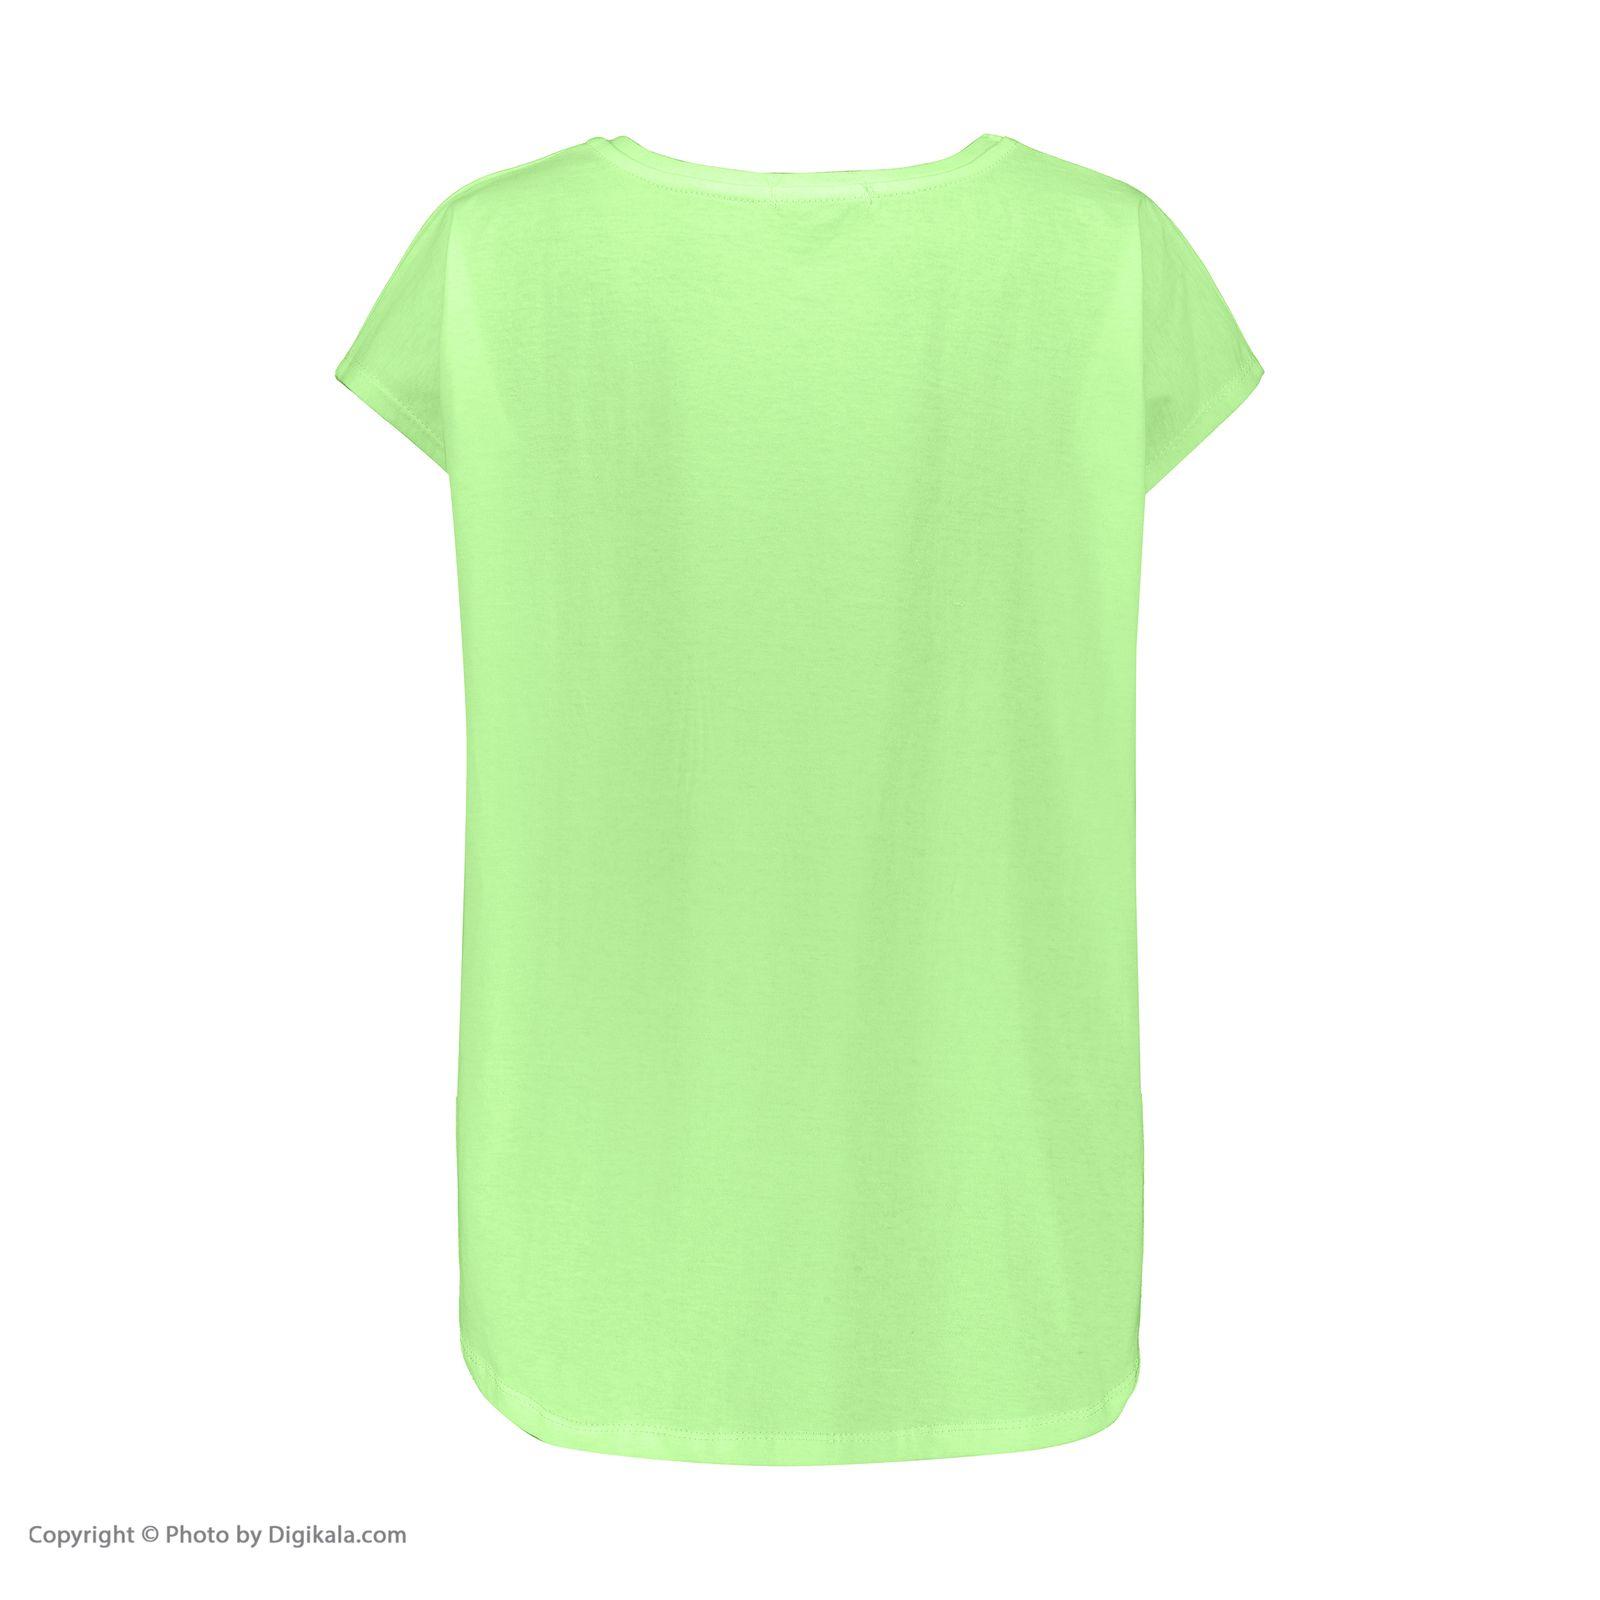 تی شرت زنانه آر ان اس مدل 1102049-43 -  - 4